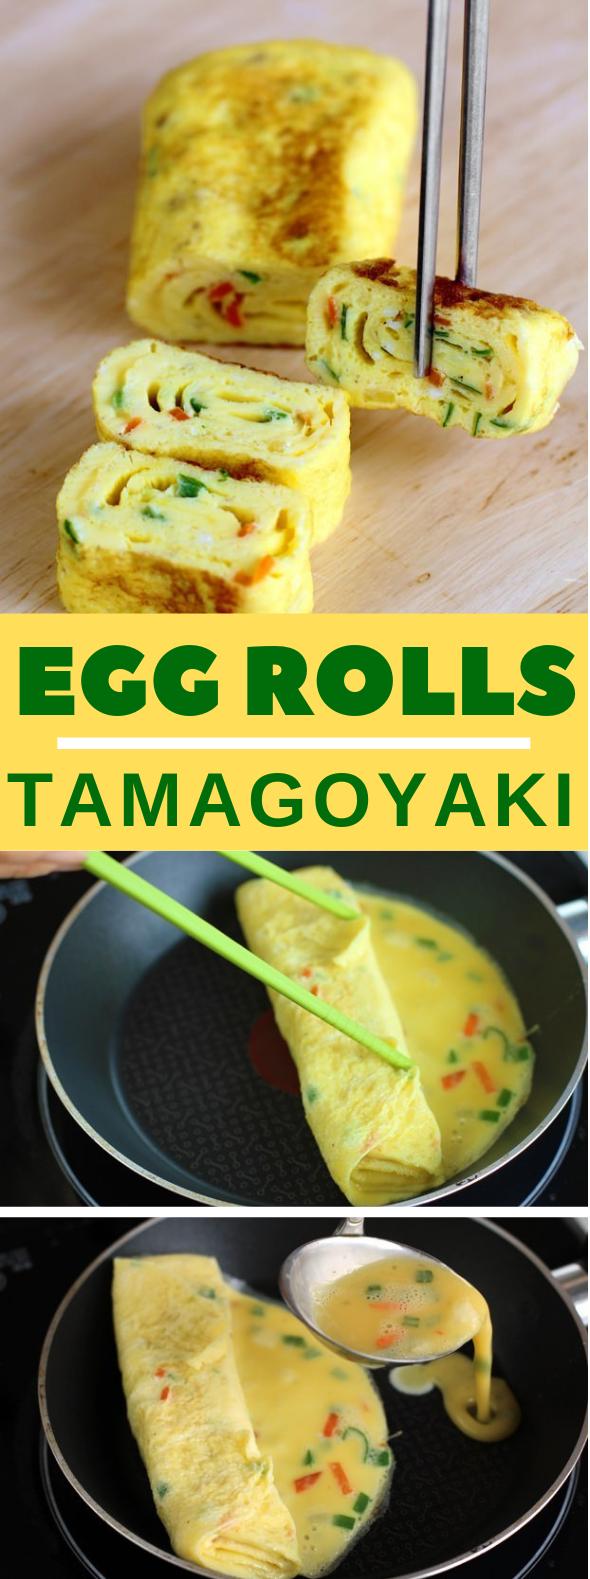 Egg Rolls Recipe - Tamagoyaki #healthyfood #koreanstyle